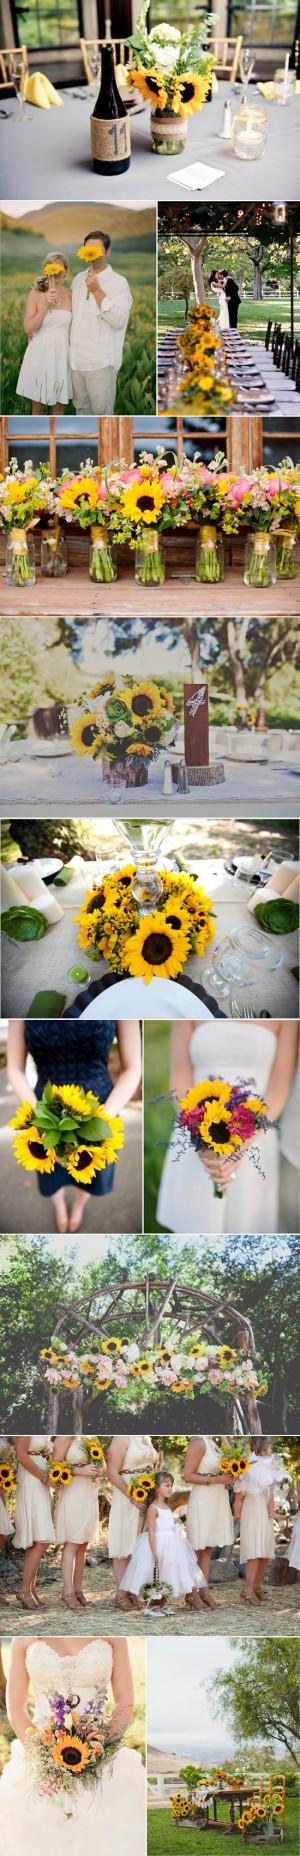 Sunflower Wedding Inspiration Sunflowers Wedding And Weddings